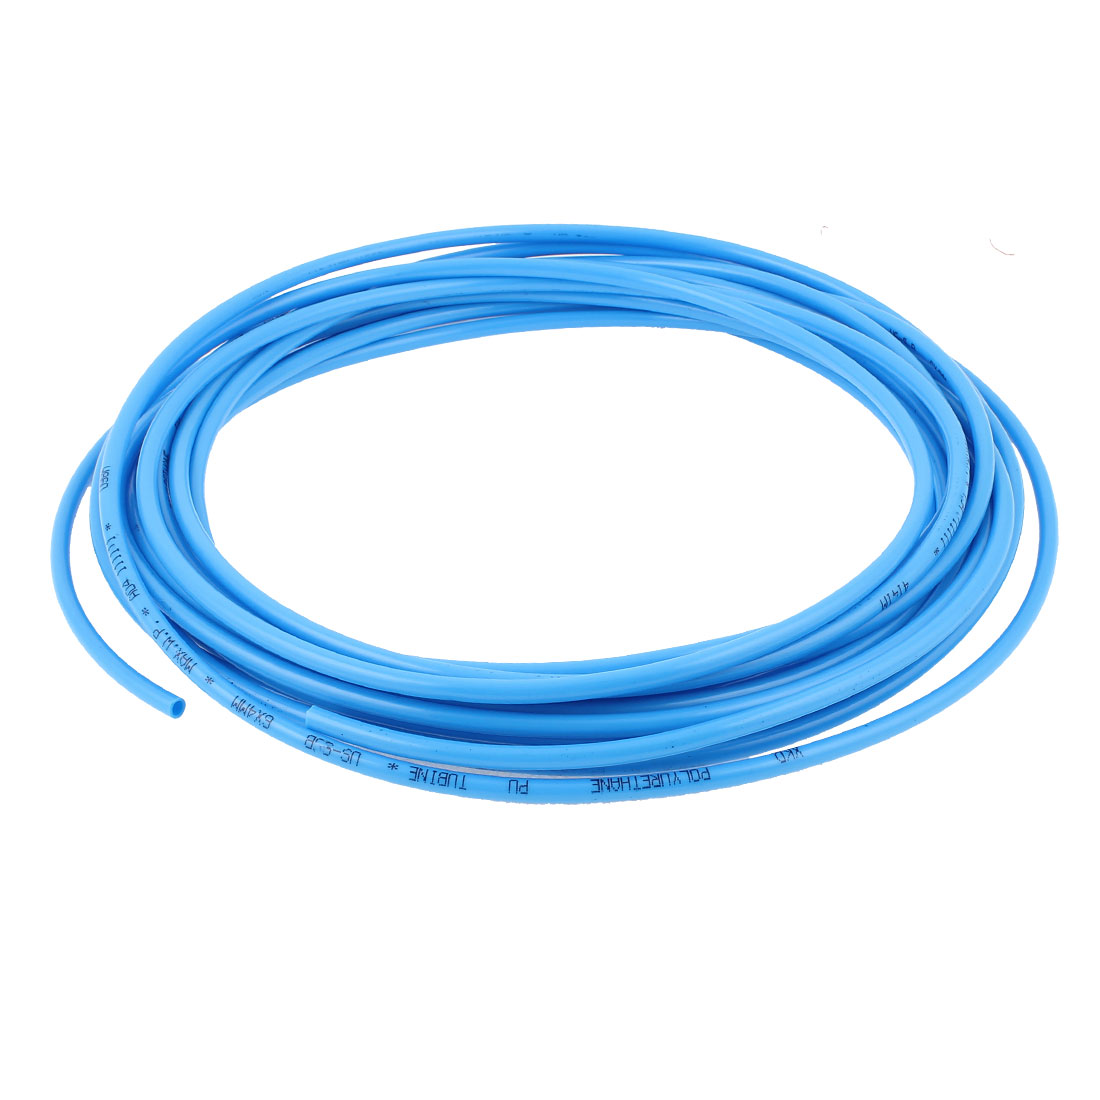 PU Flexible Compresser Pneumatic Pipe Tube Air Tubing Hose 6mm x 4mm 10M